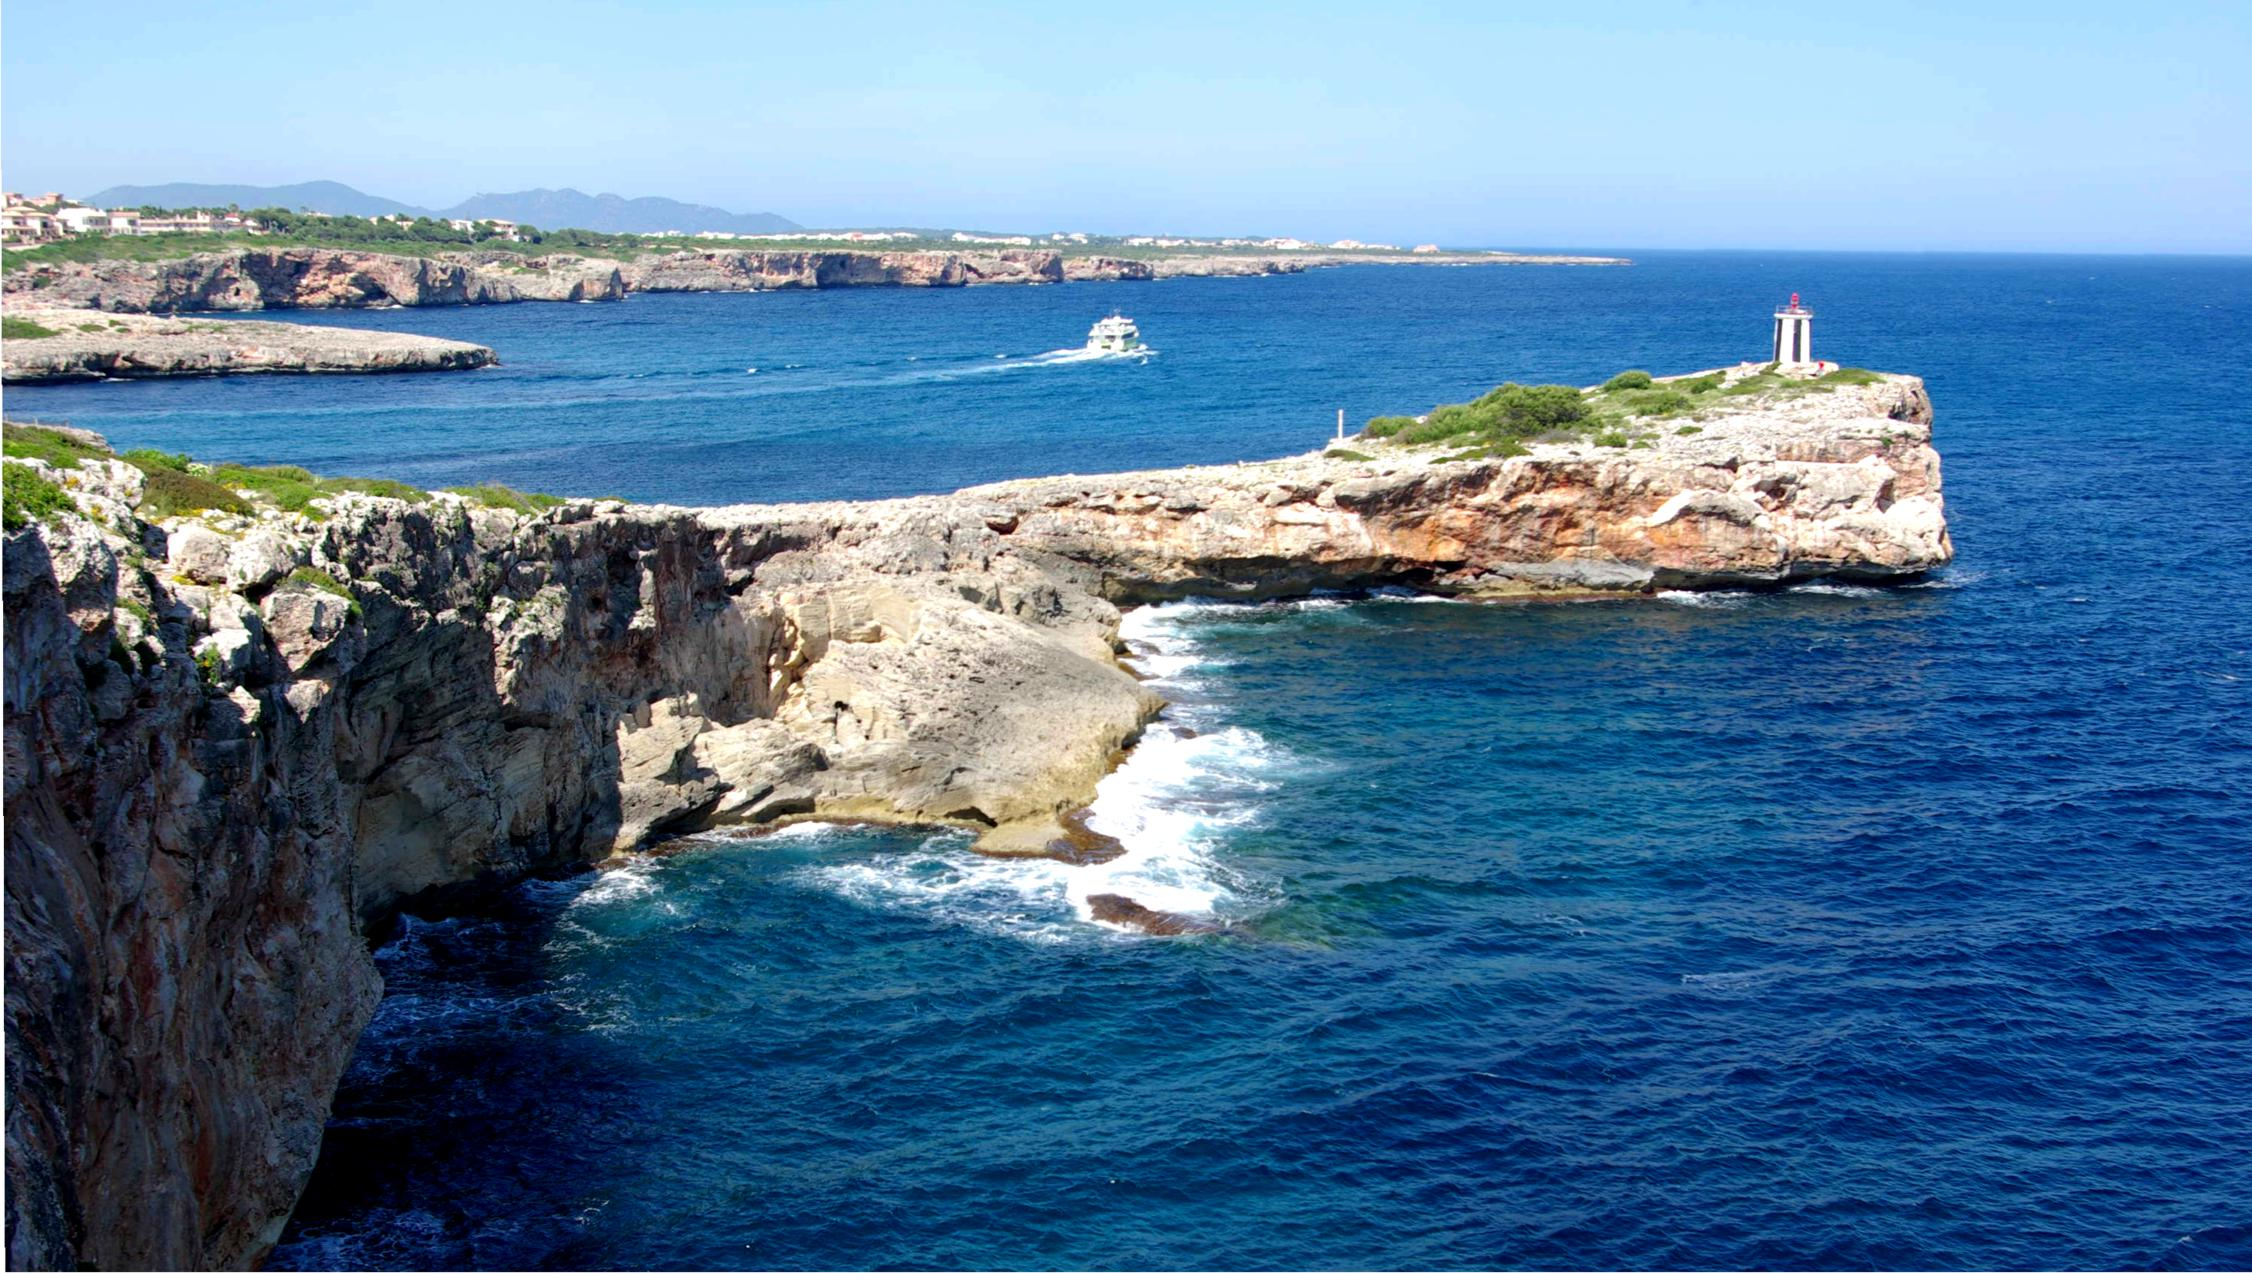 Foto playa Cala Murta. Punta Porto Cristo Mallorca - Buy a print in - http://cafate.blogspot.com/